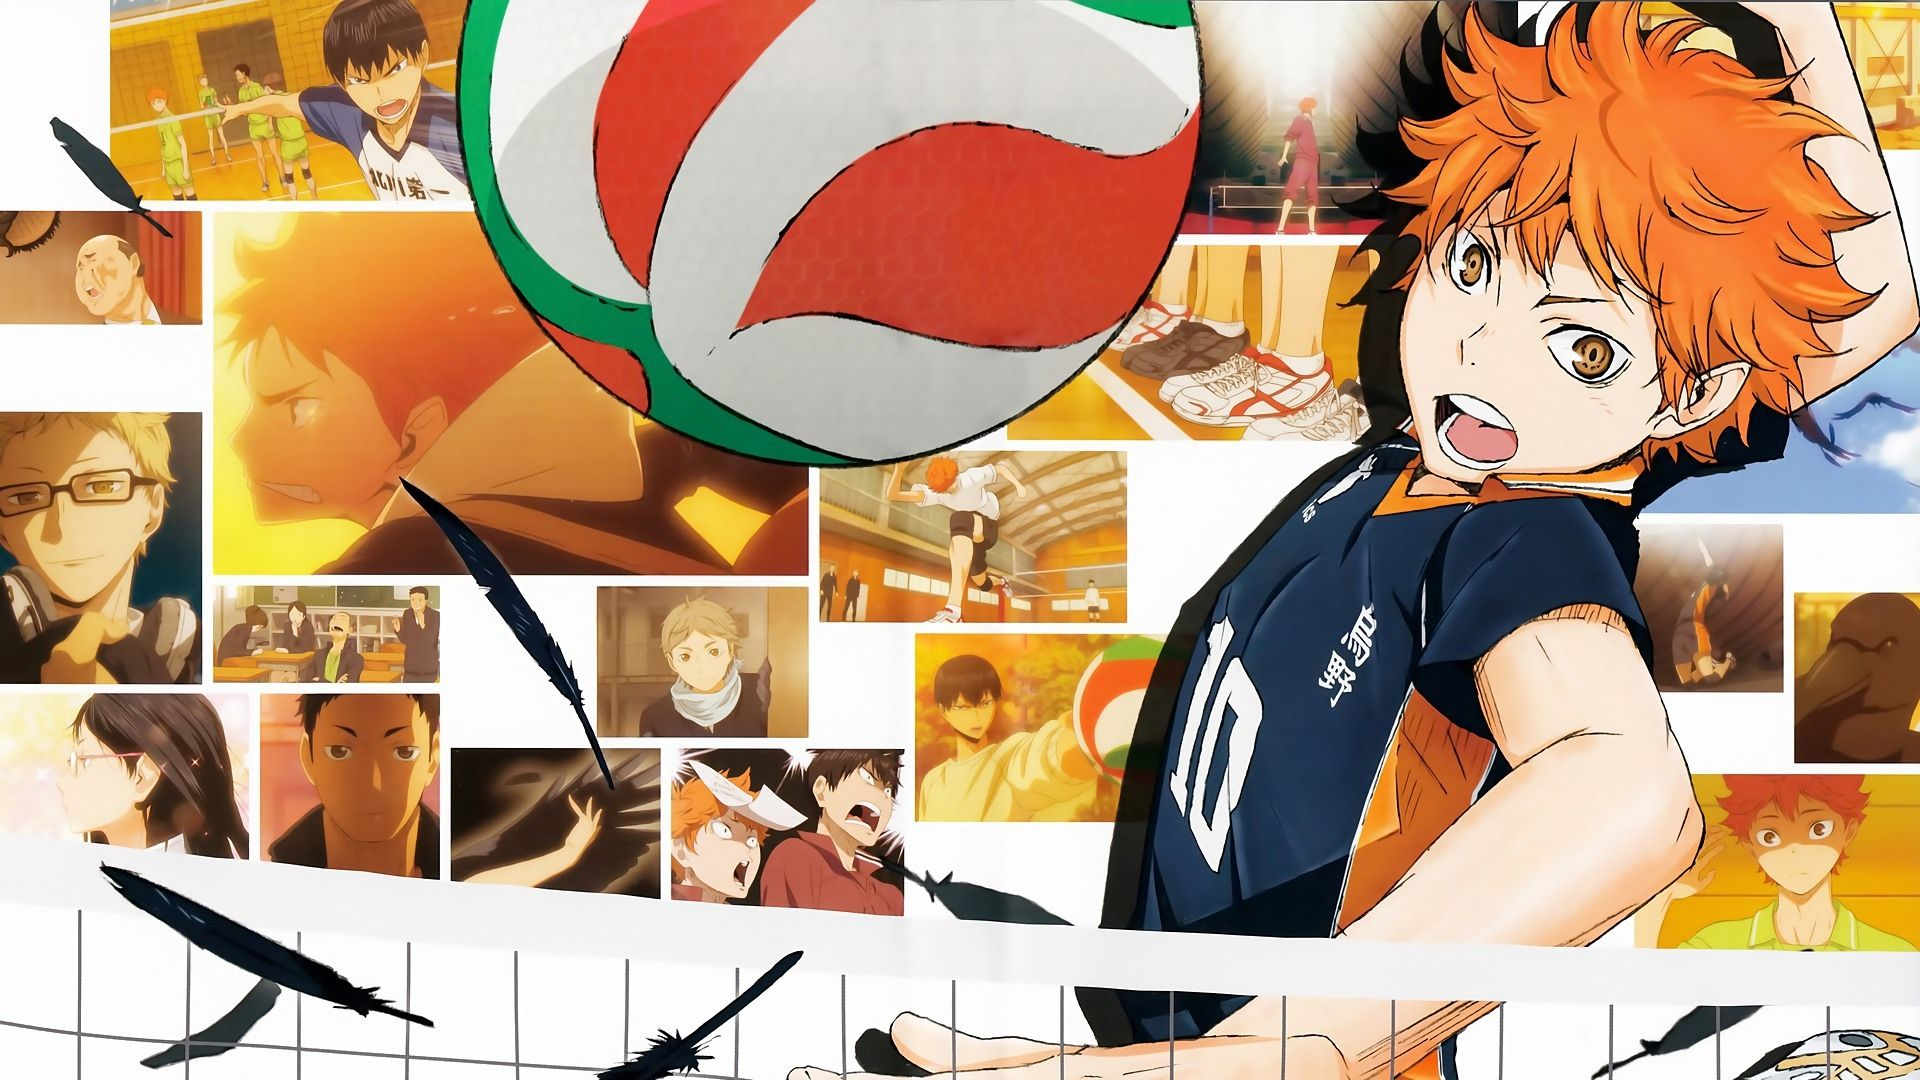 Anime Volleyball Haikyuu!! Forward